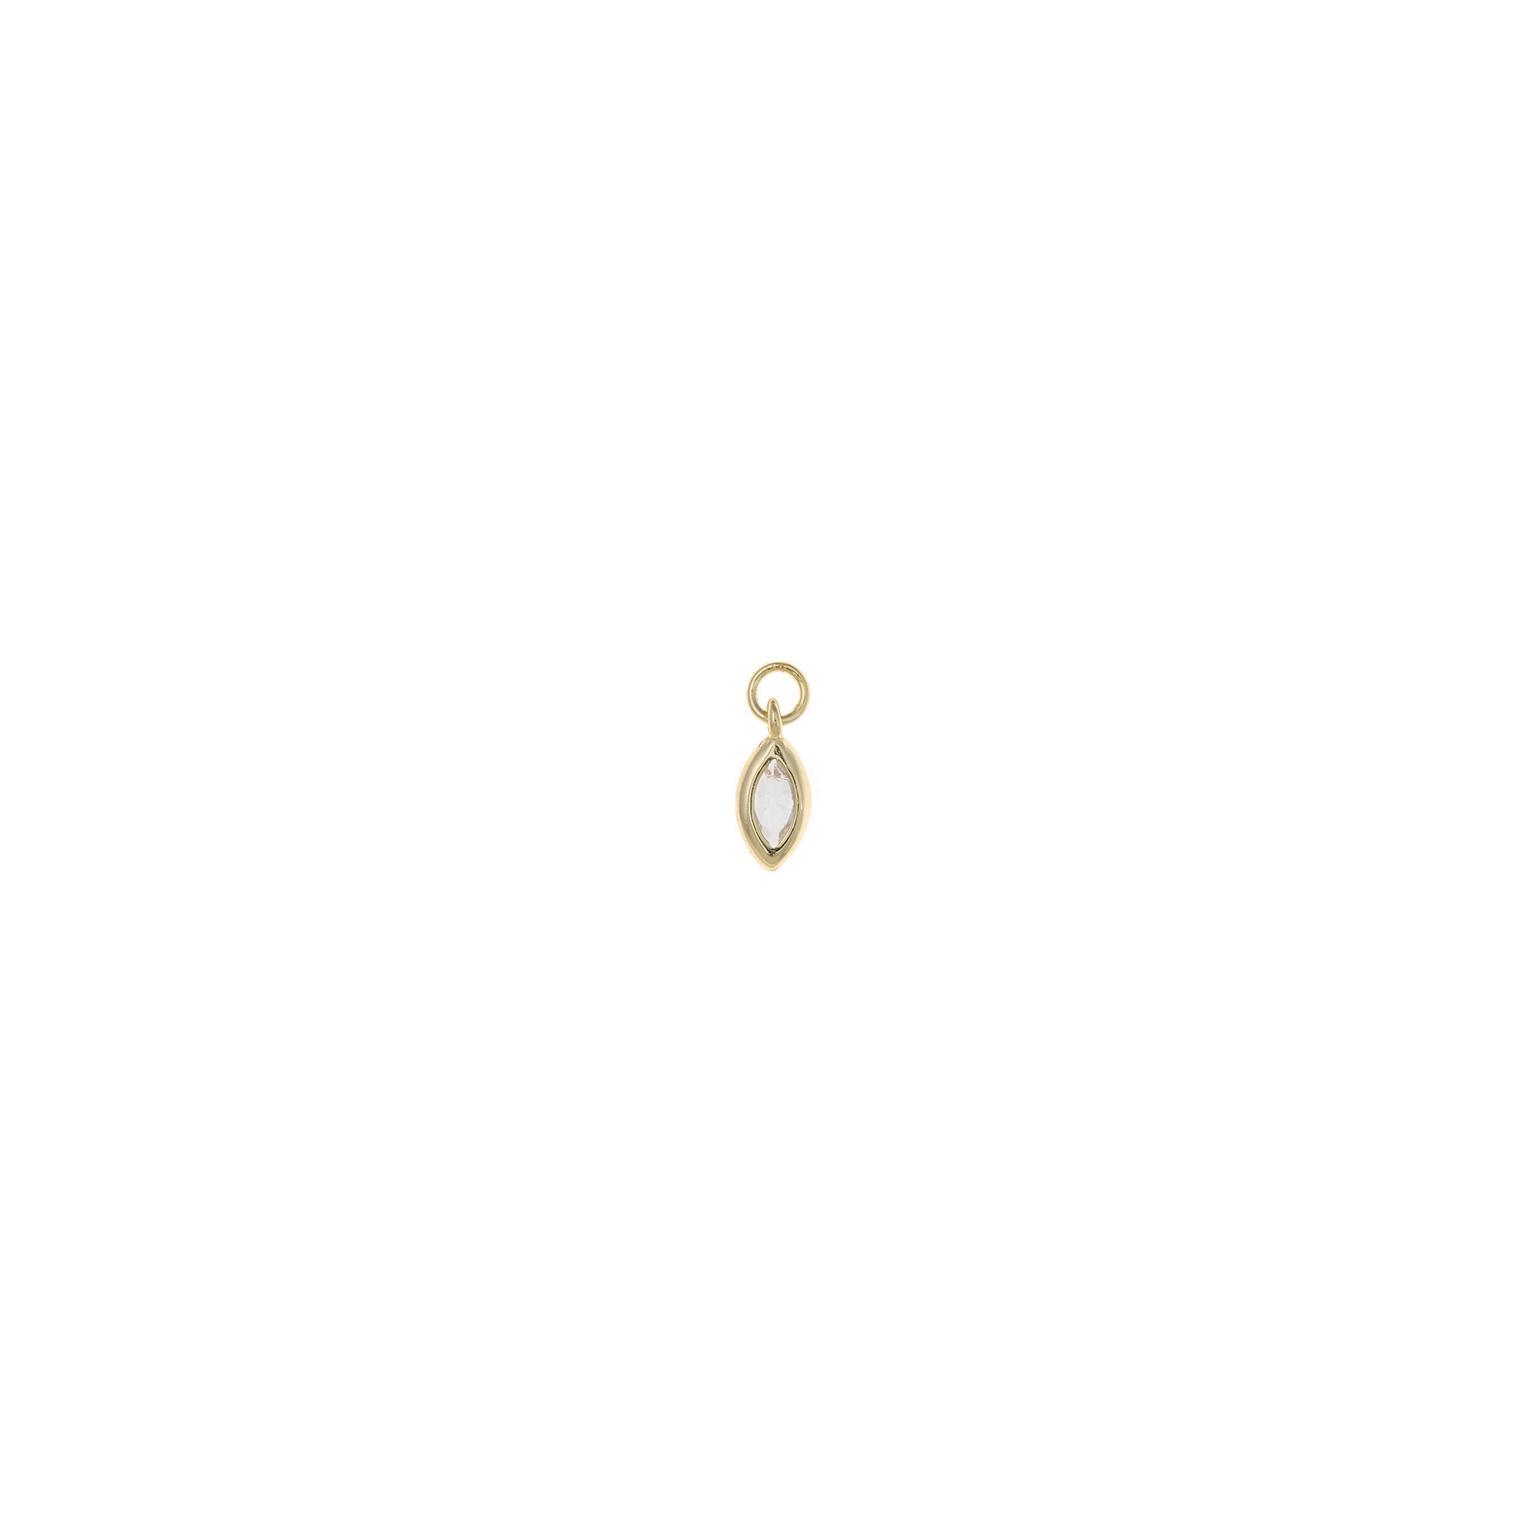 Charm plata Salvatore  marquesa circonita blanca dorado